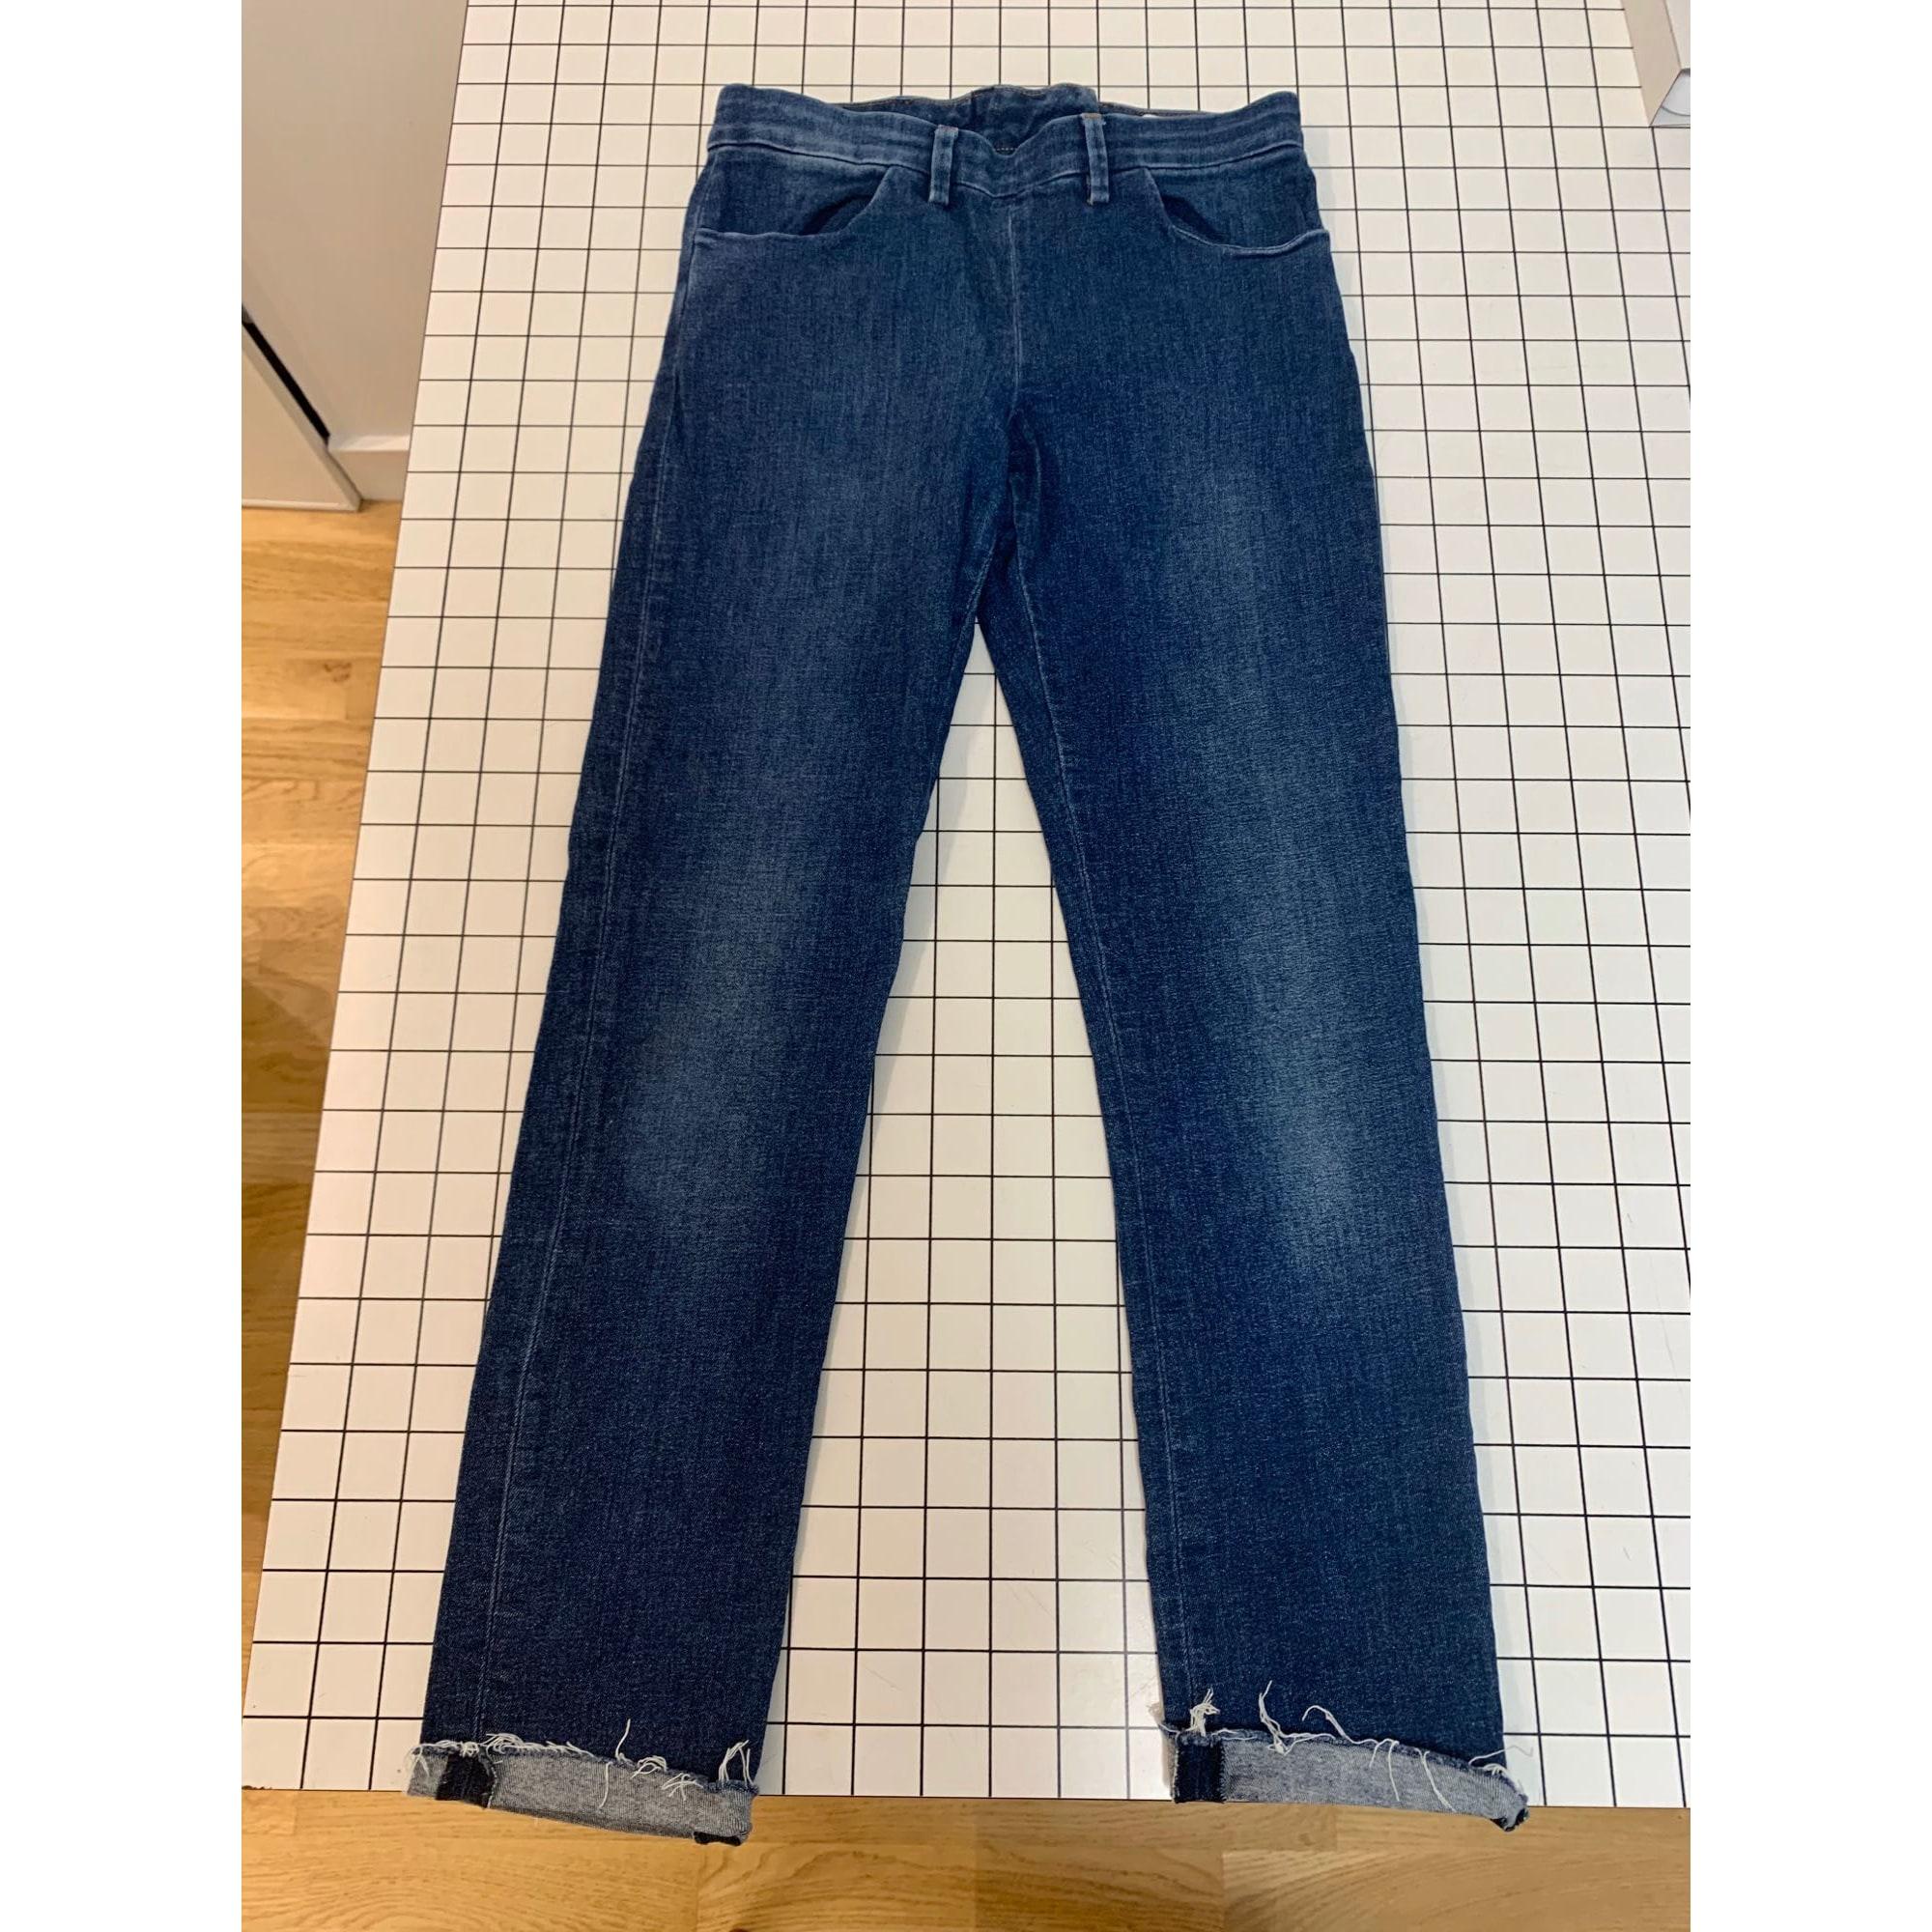 Jeans slim ACNE Bleu, bleu marine, bleu turquoise